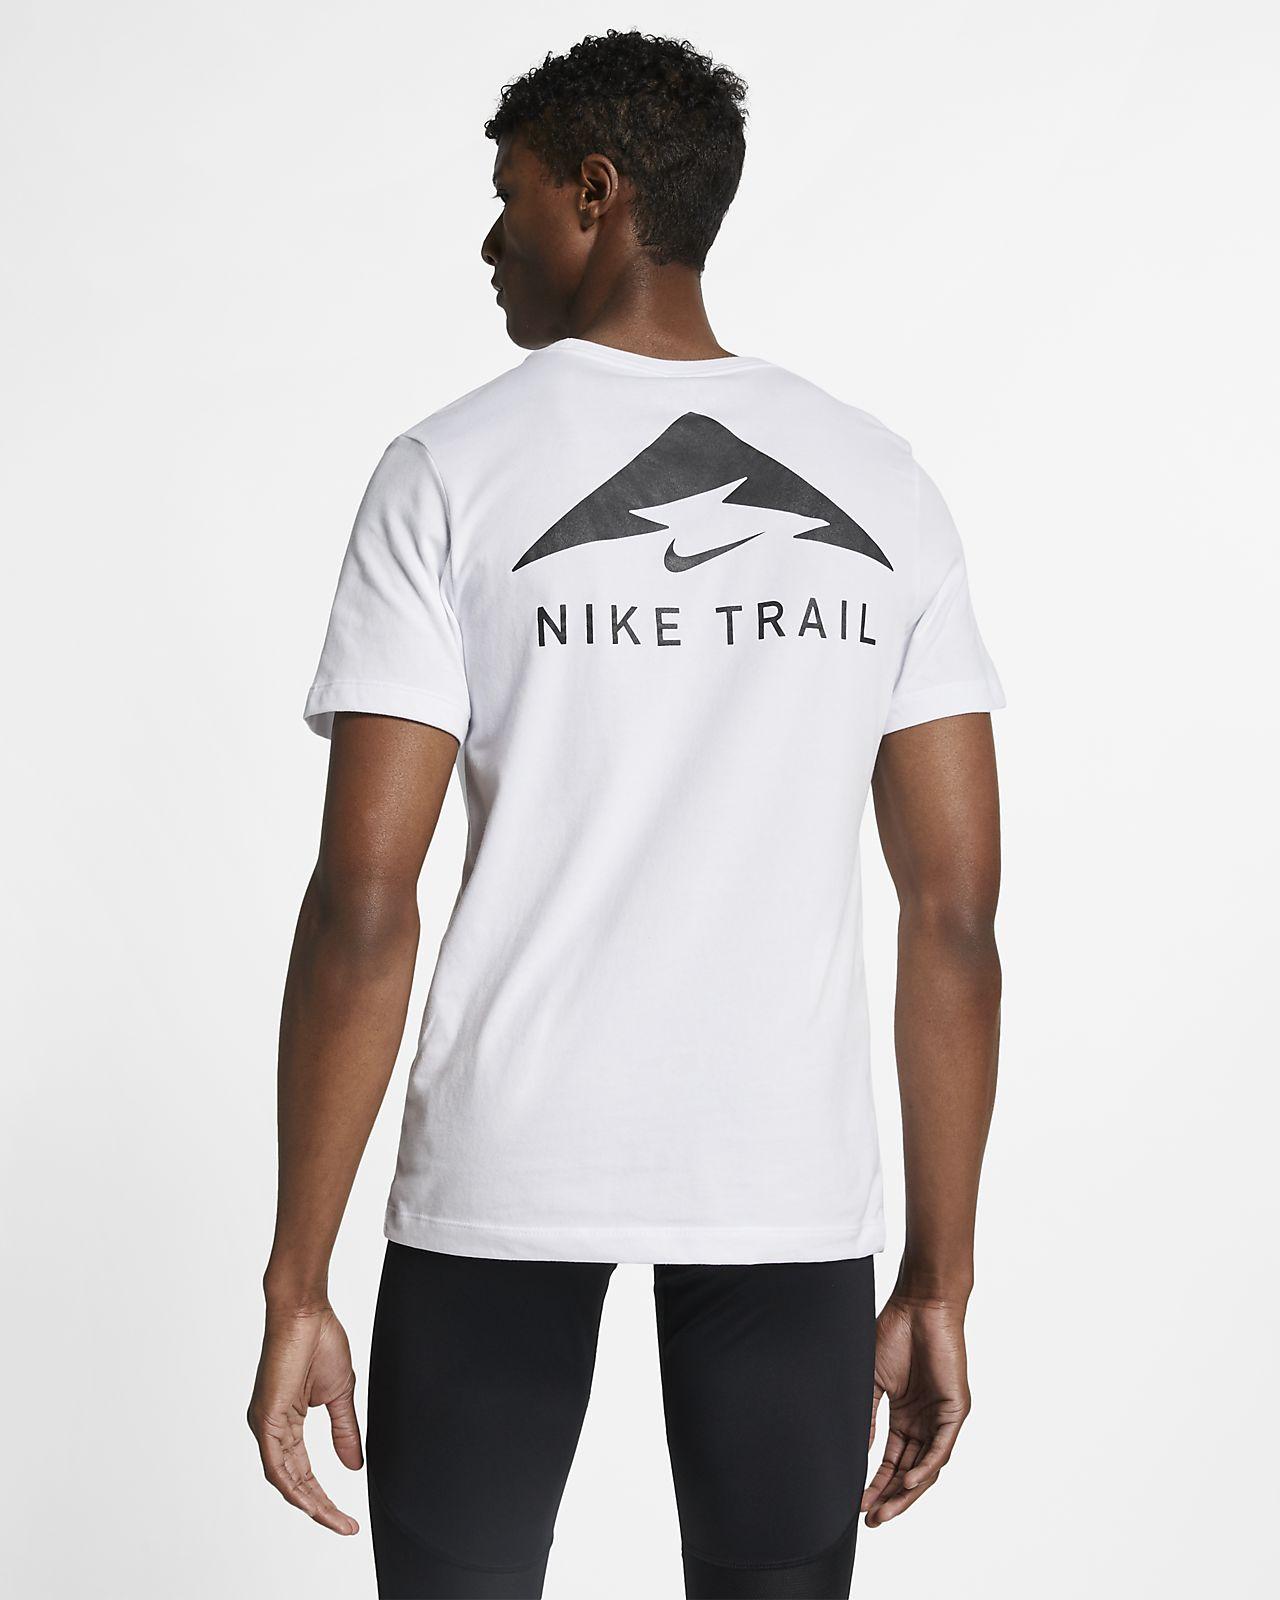 Nike Dri FIT Men's Running T Shirt Size 2XL (White)   Nike